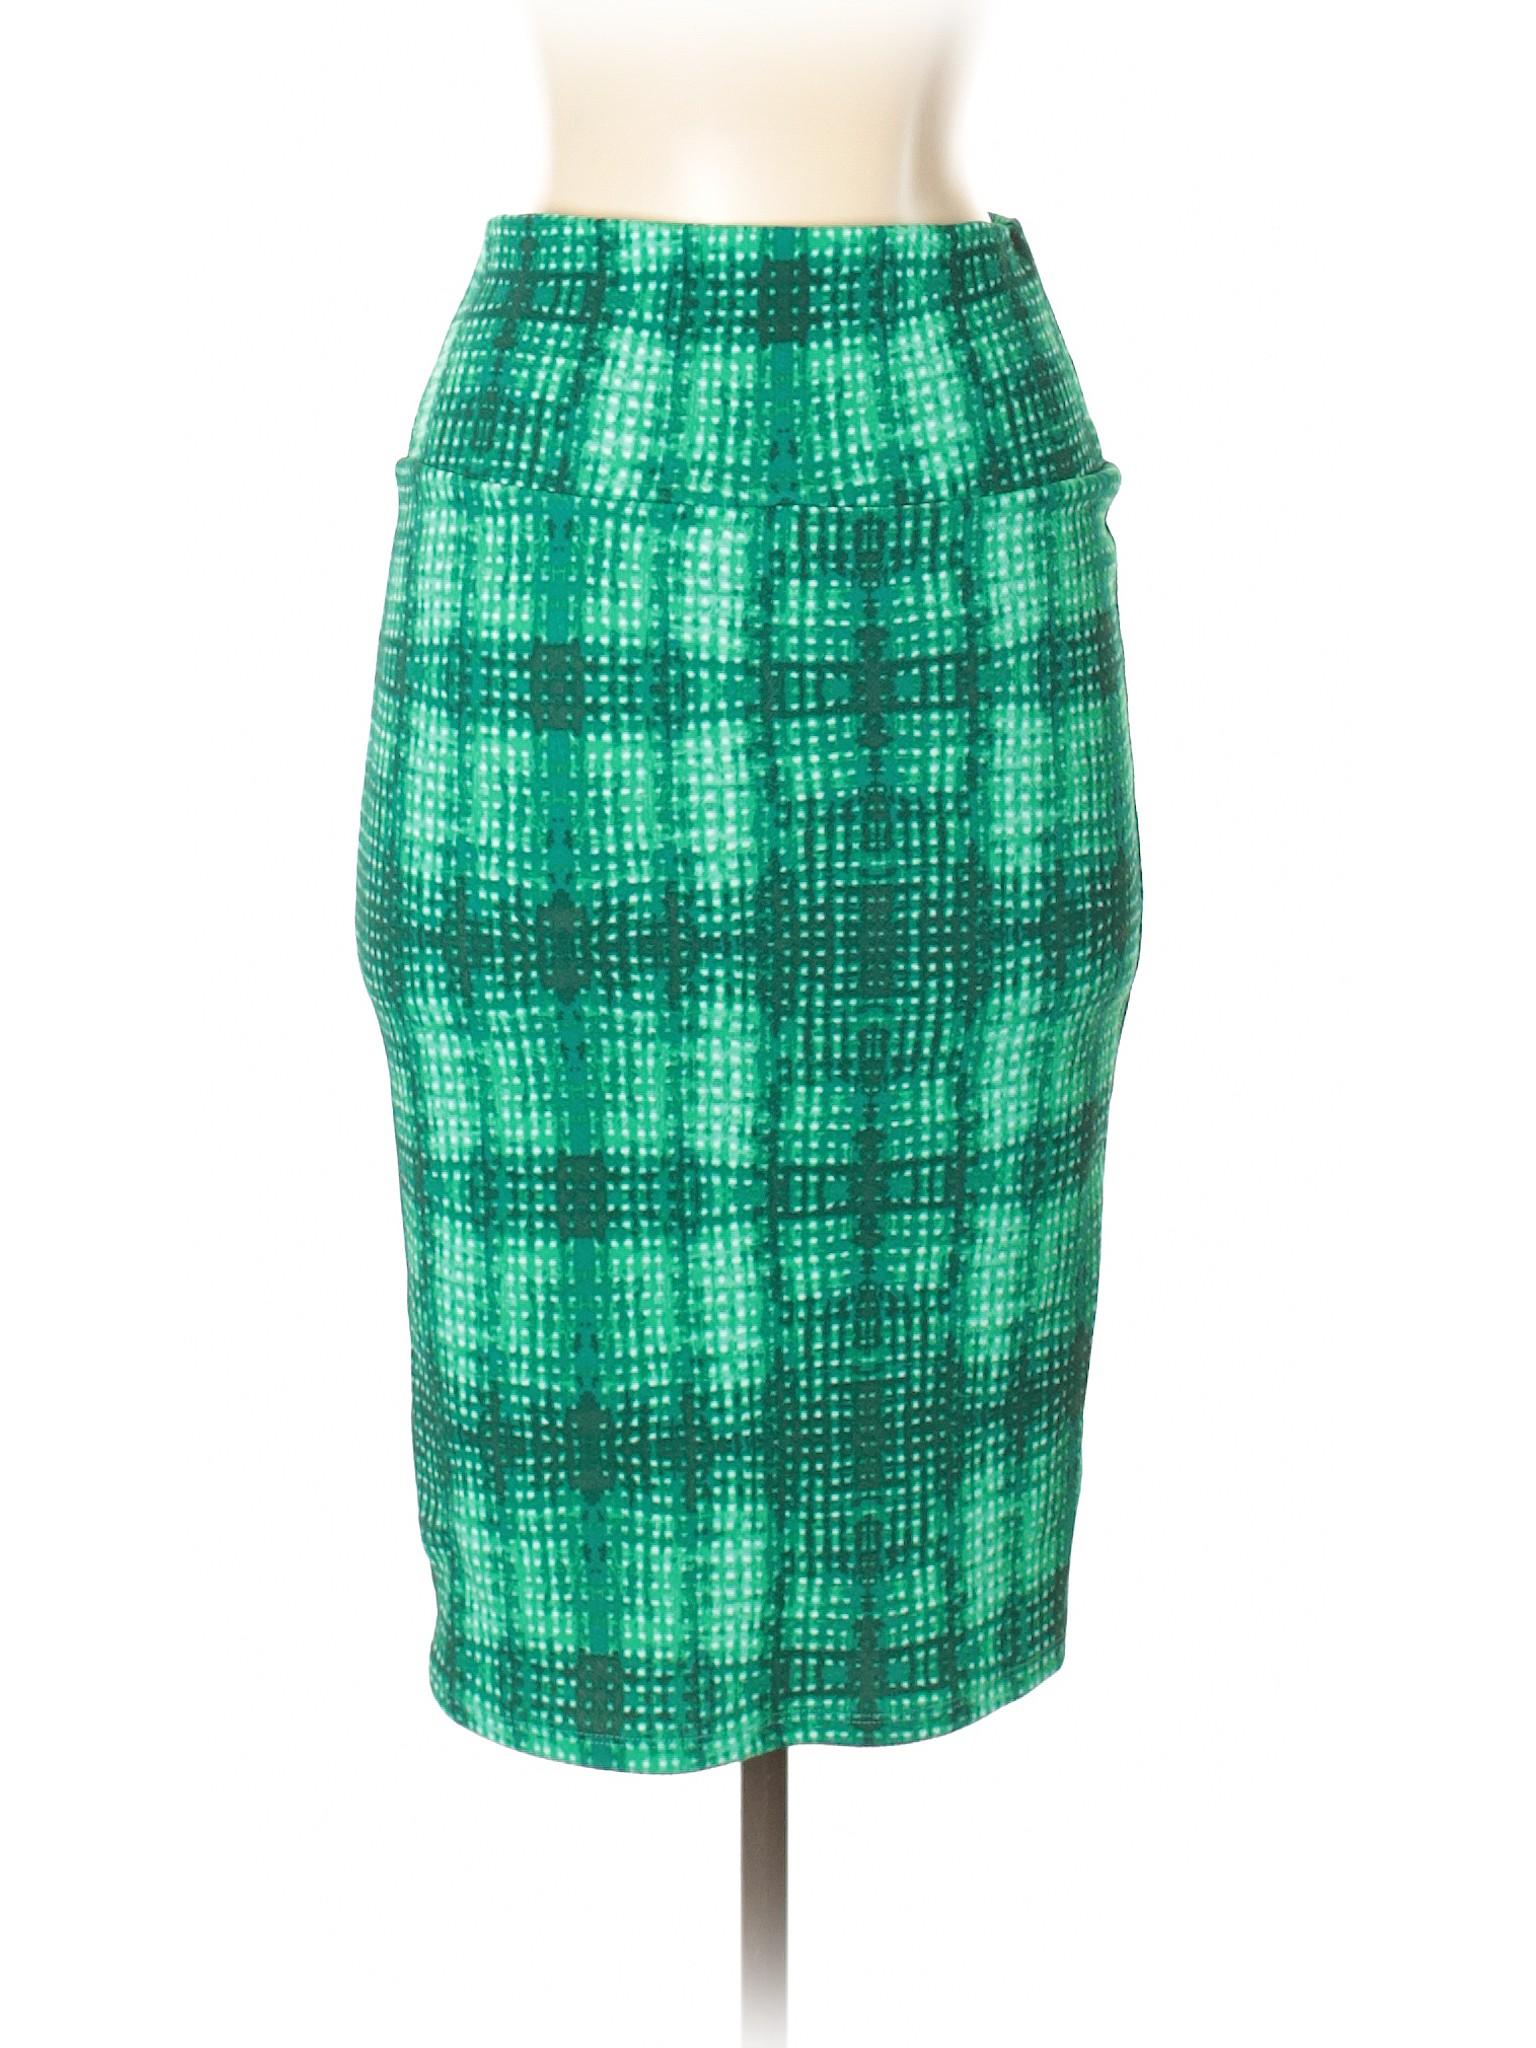 Lularoe Casual Casual Skirt Boutique Lularoe Skirt Boutique Casual Lularoe Boutique gOwqF5p